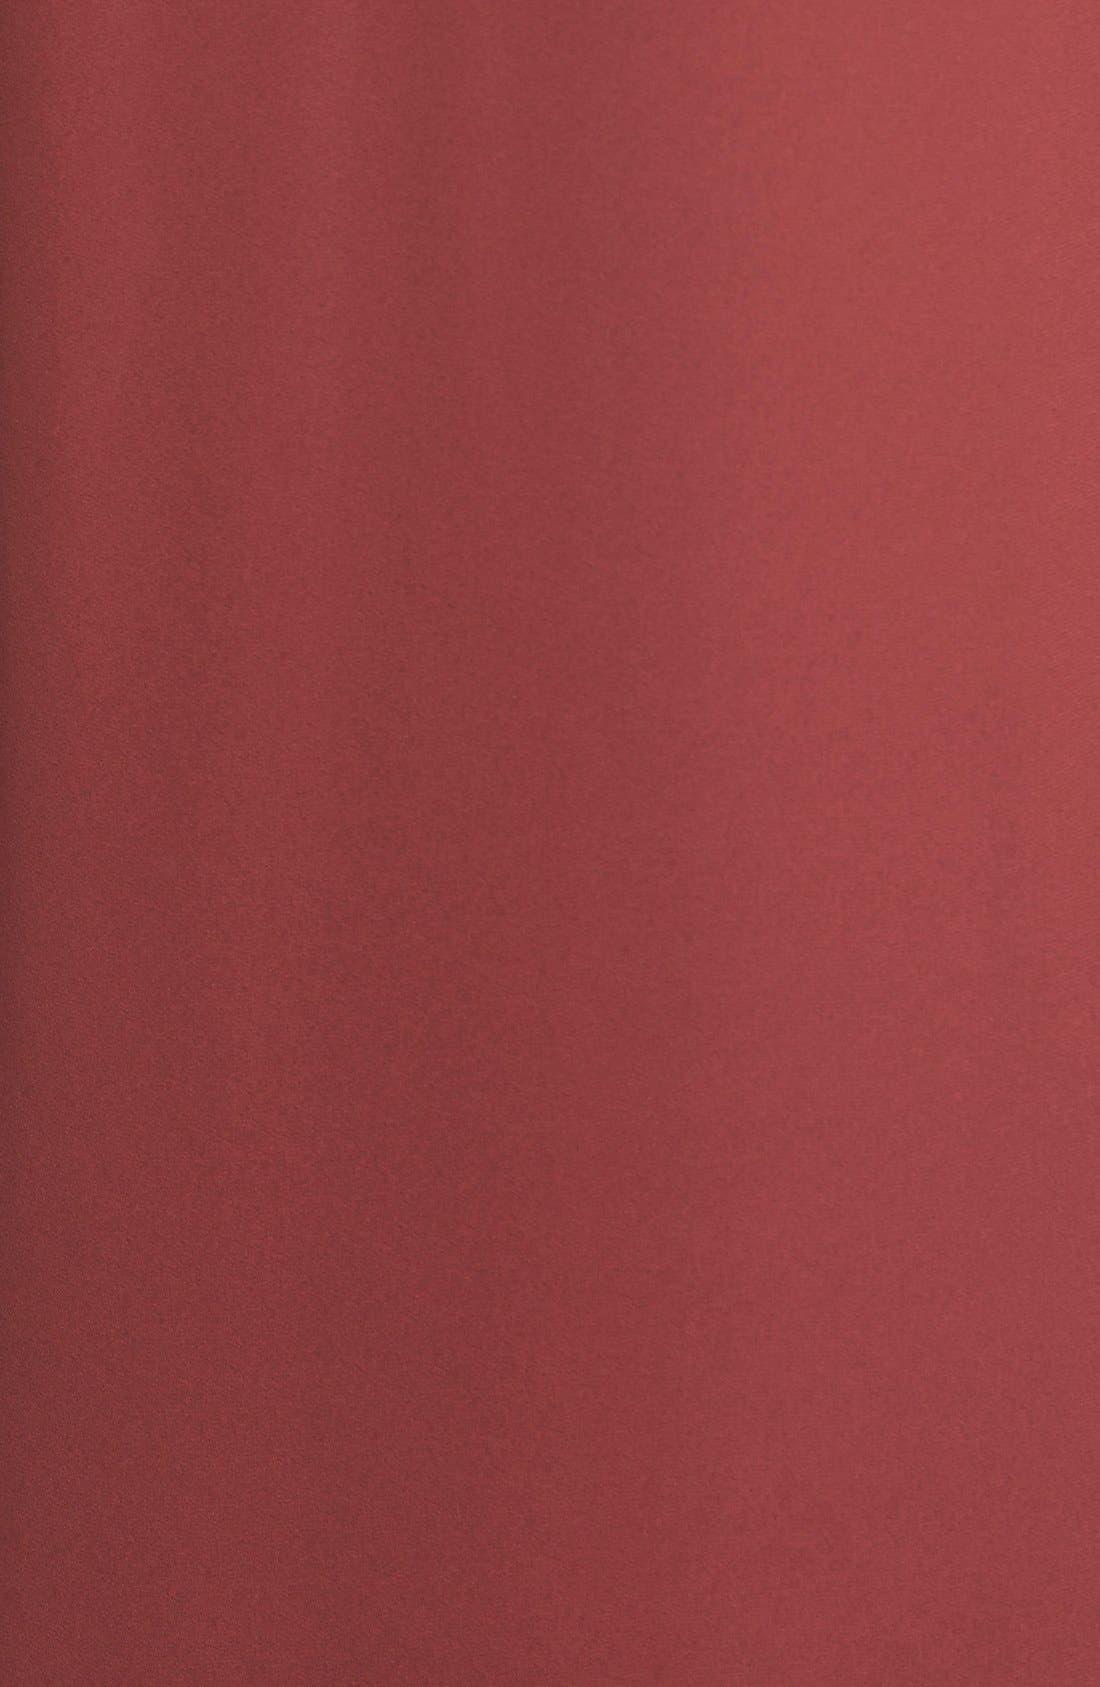 Alternate Image 3  - Sleeveless High/Low Tunic Top